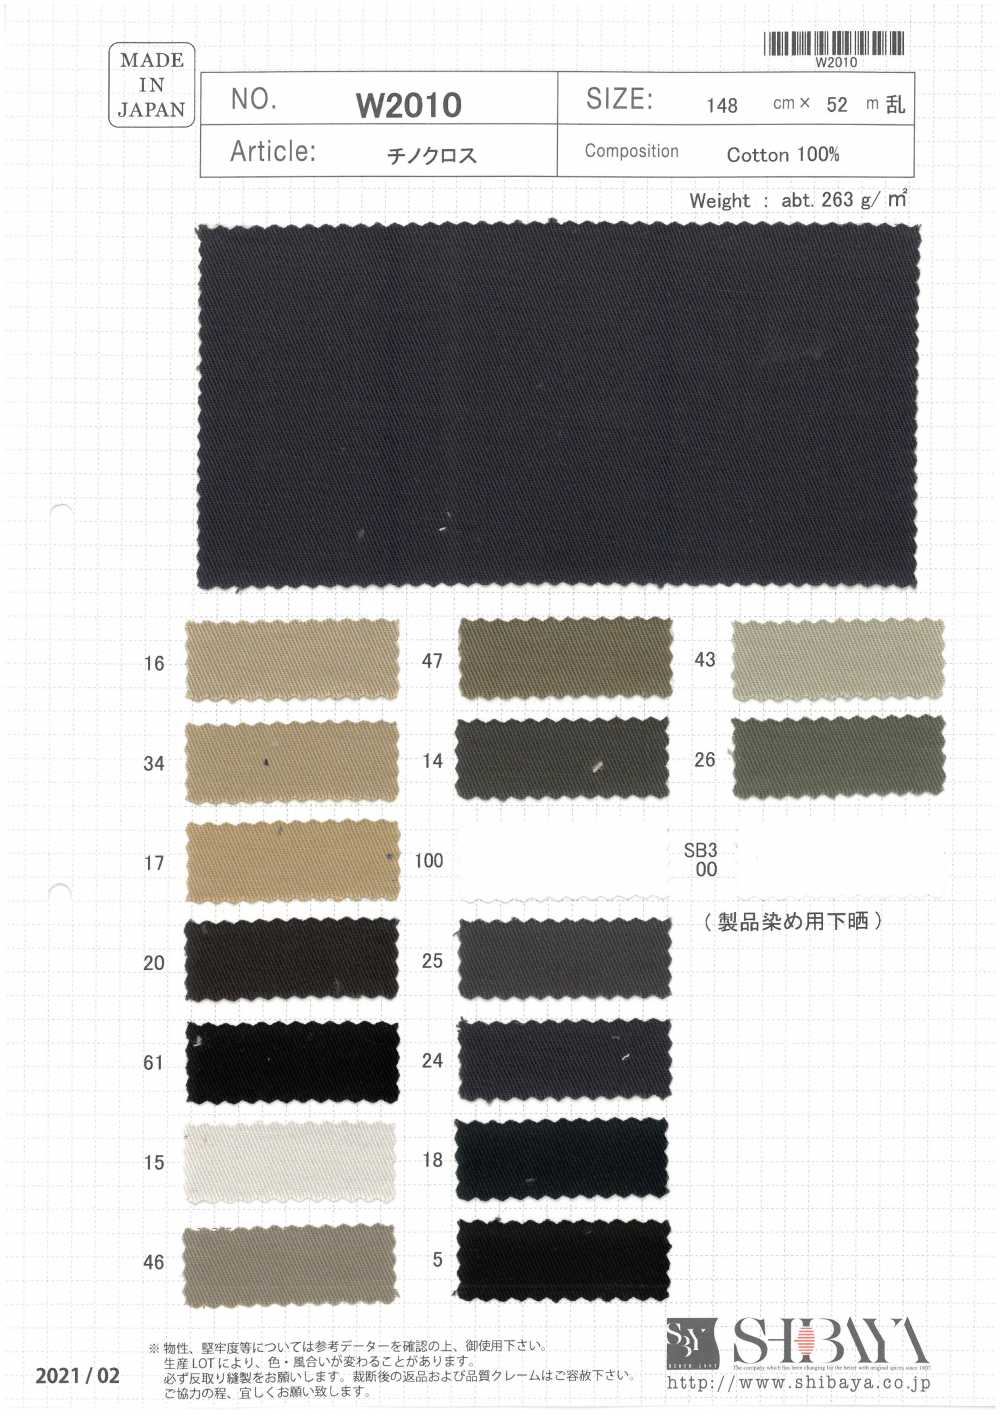 W2010 チノクロス[生地] 柴屋/オークラ商事 - ApparelX アパレル資材卸通販